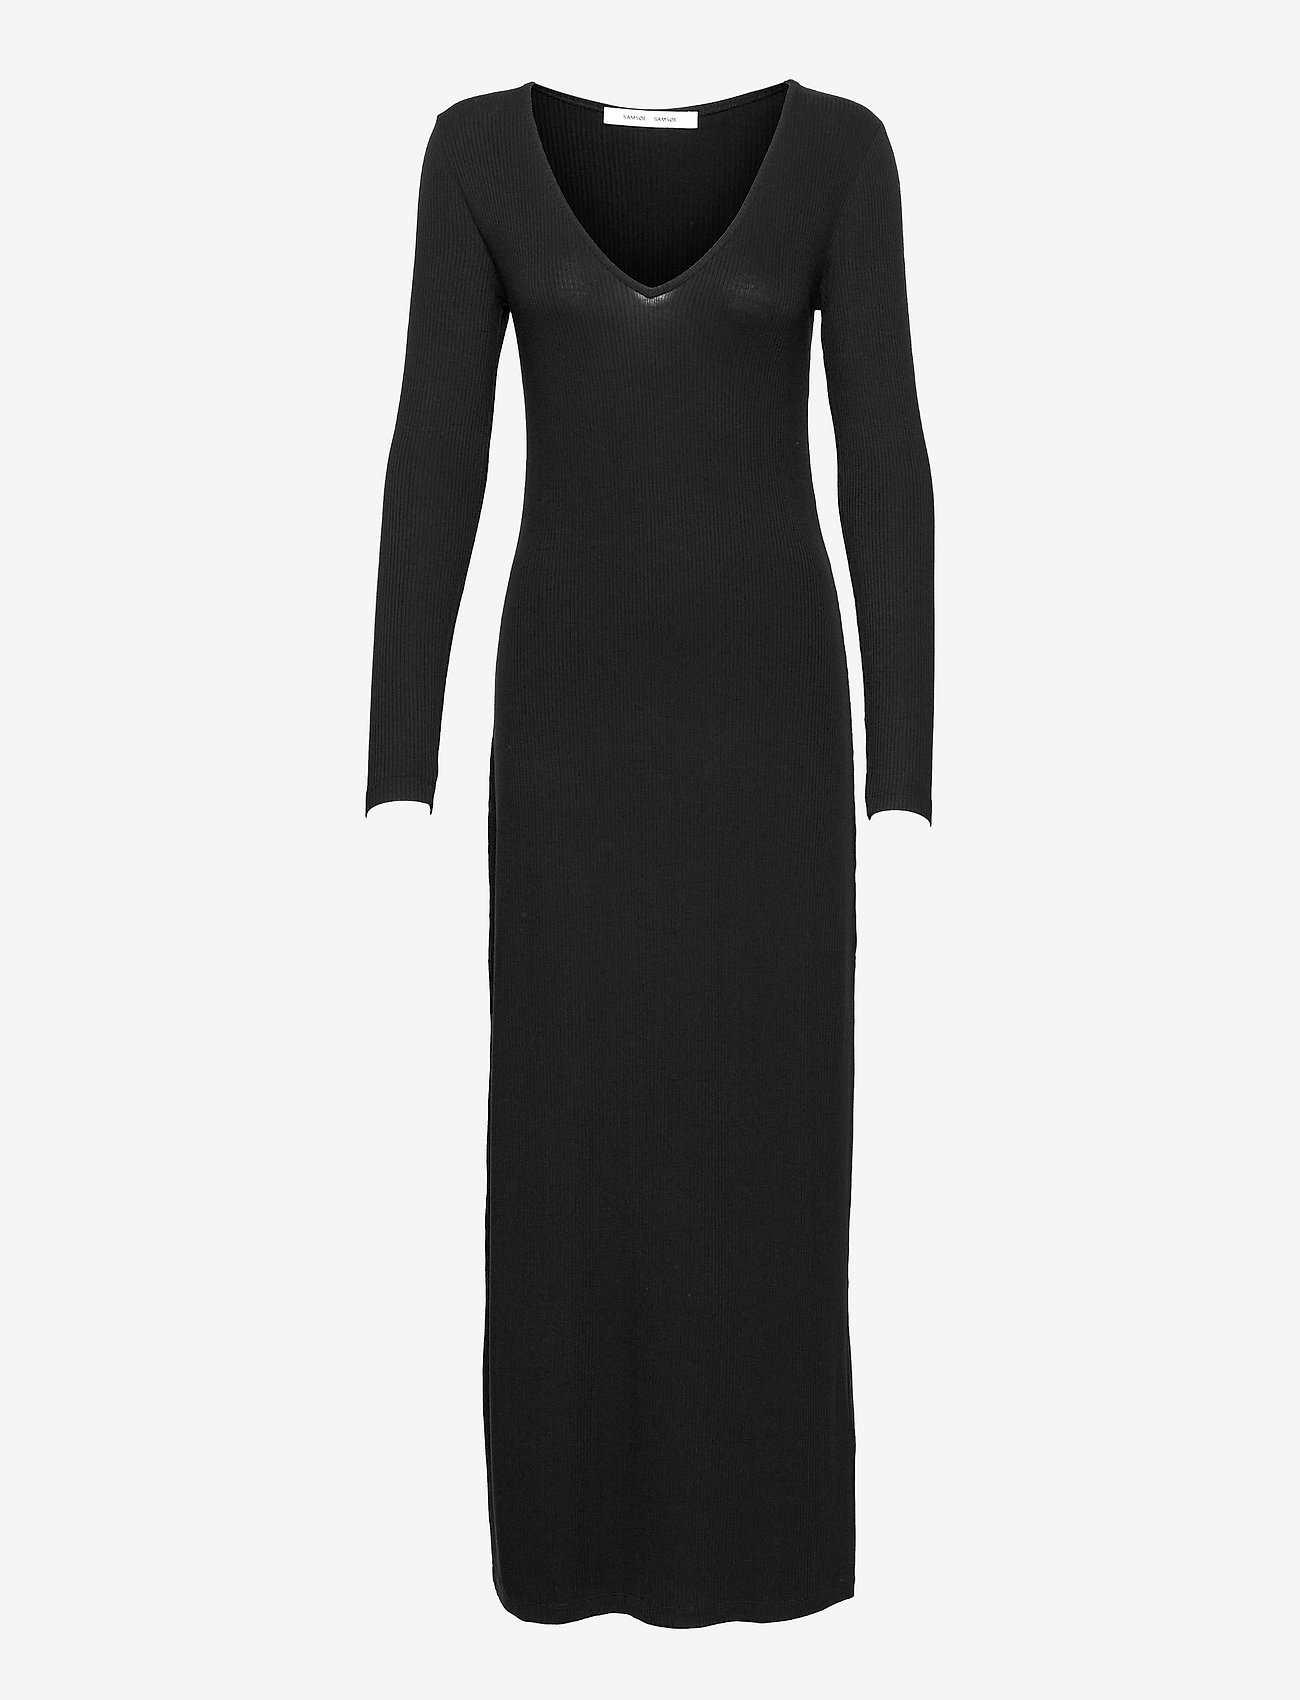 Samsøe Samsøe - Patty long dress 14119 - kveldskjoler - black - 0